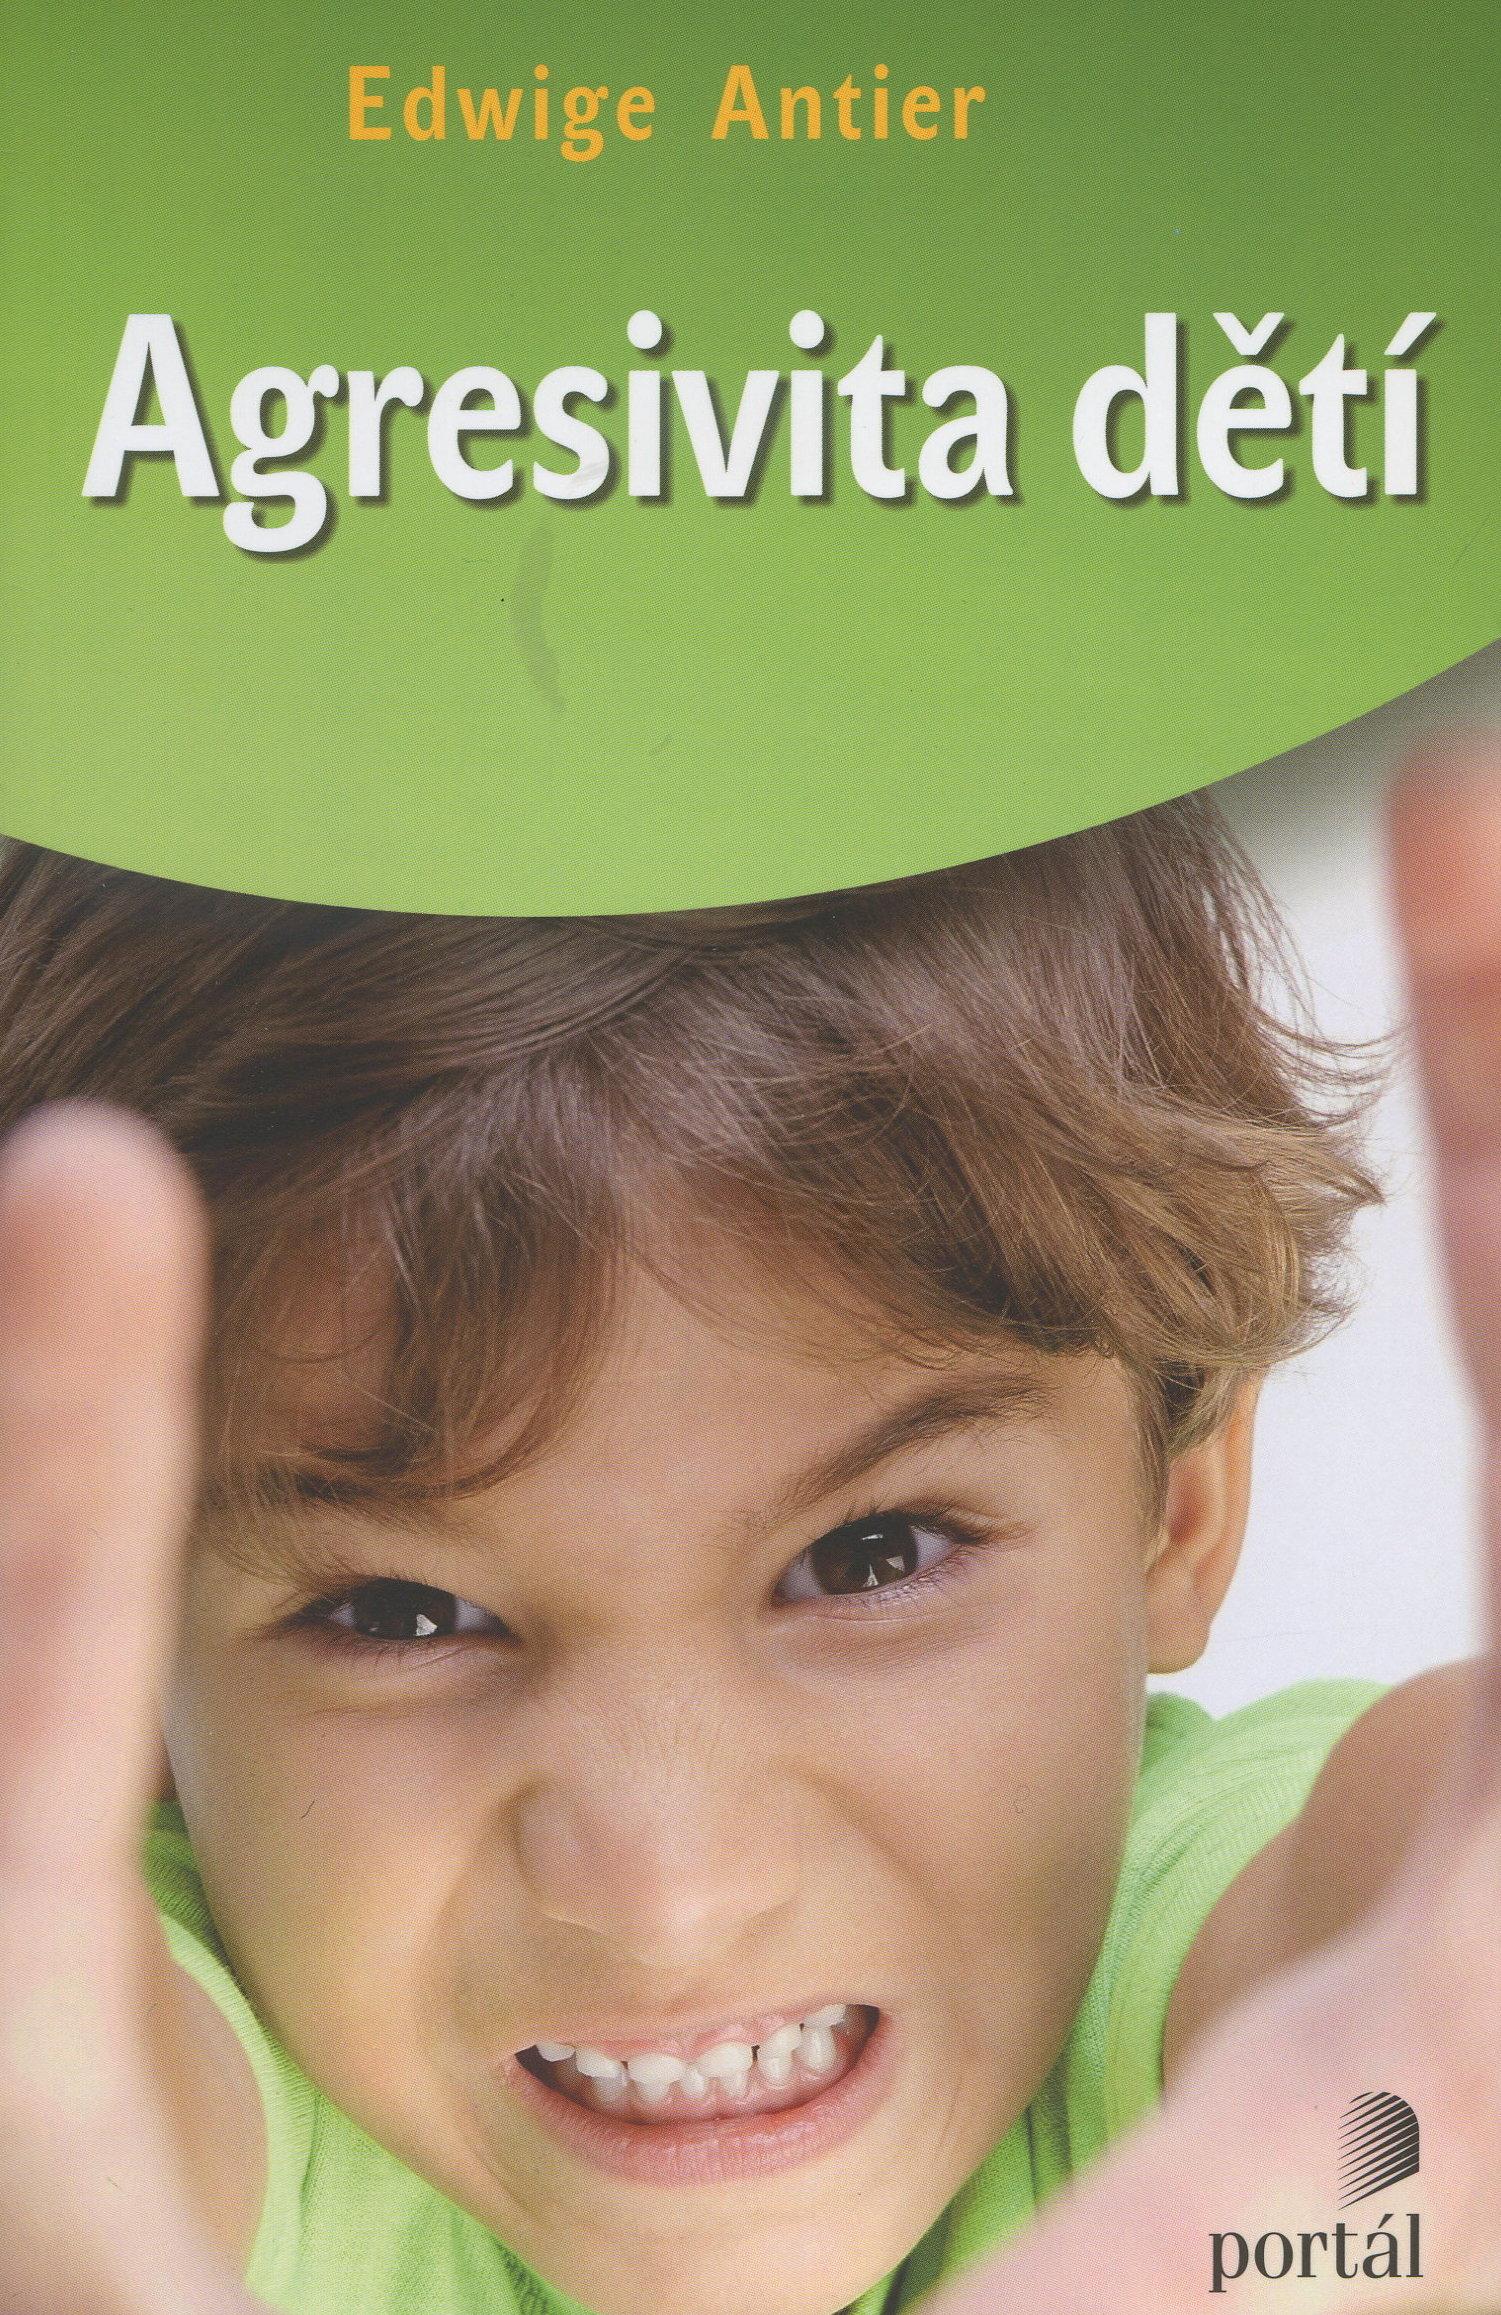 Agresivita dětí